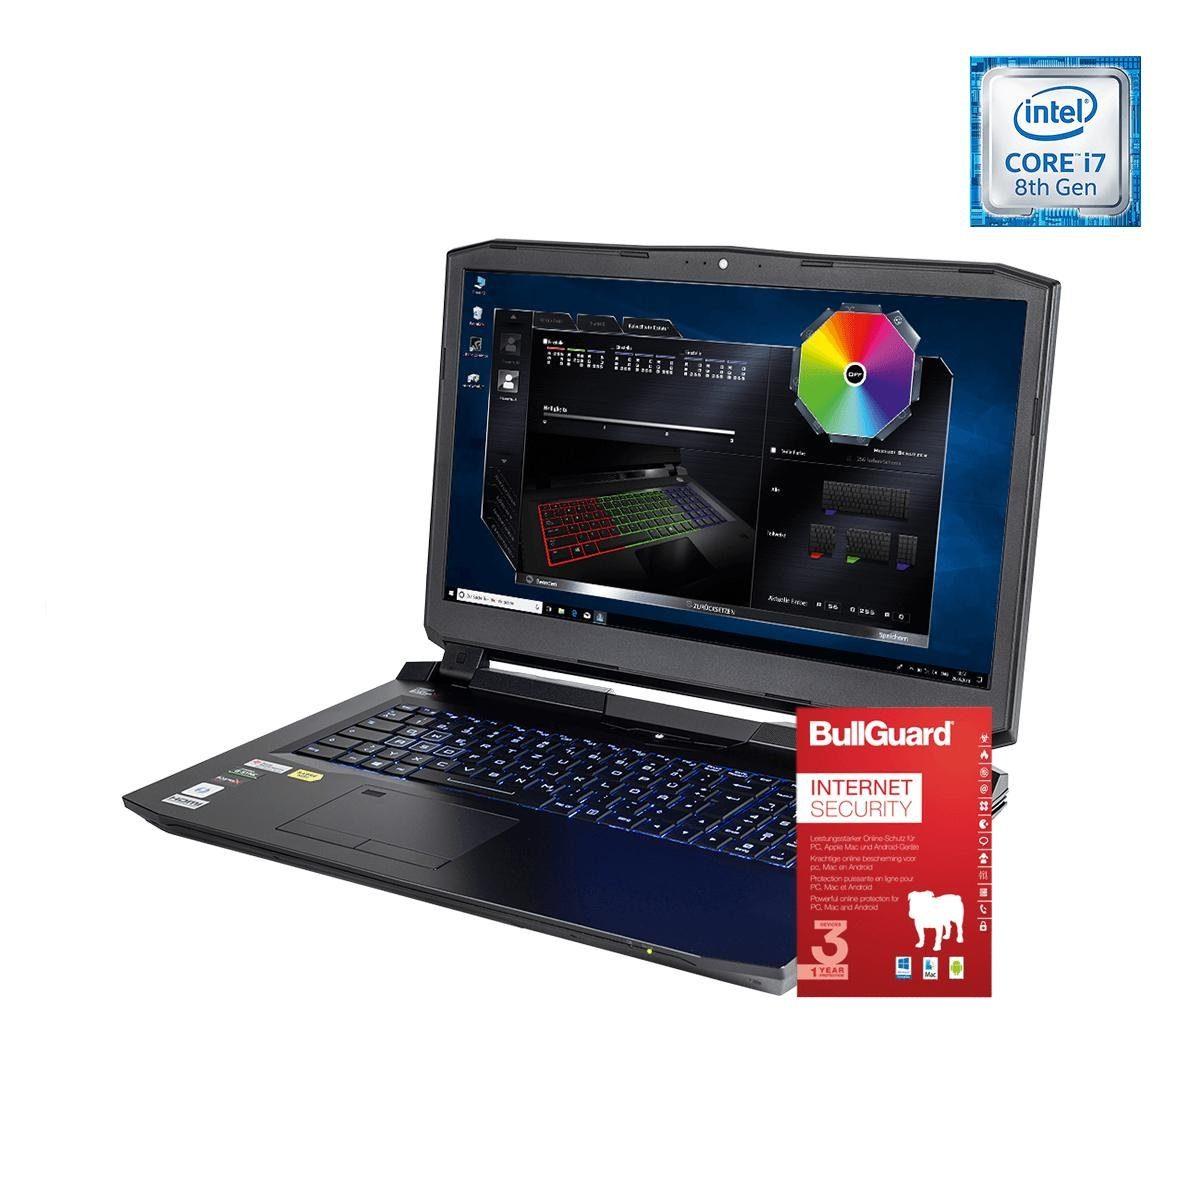 ONE GAMING Notebook, Core i7-8700K, GeForce GTX 1080, 32GB DDR4 RAM »NB 44922«